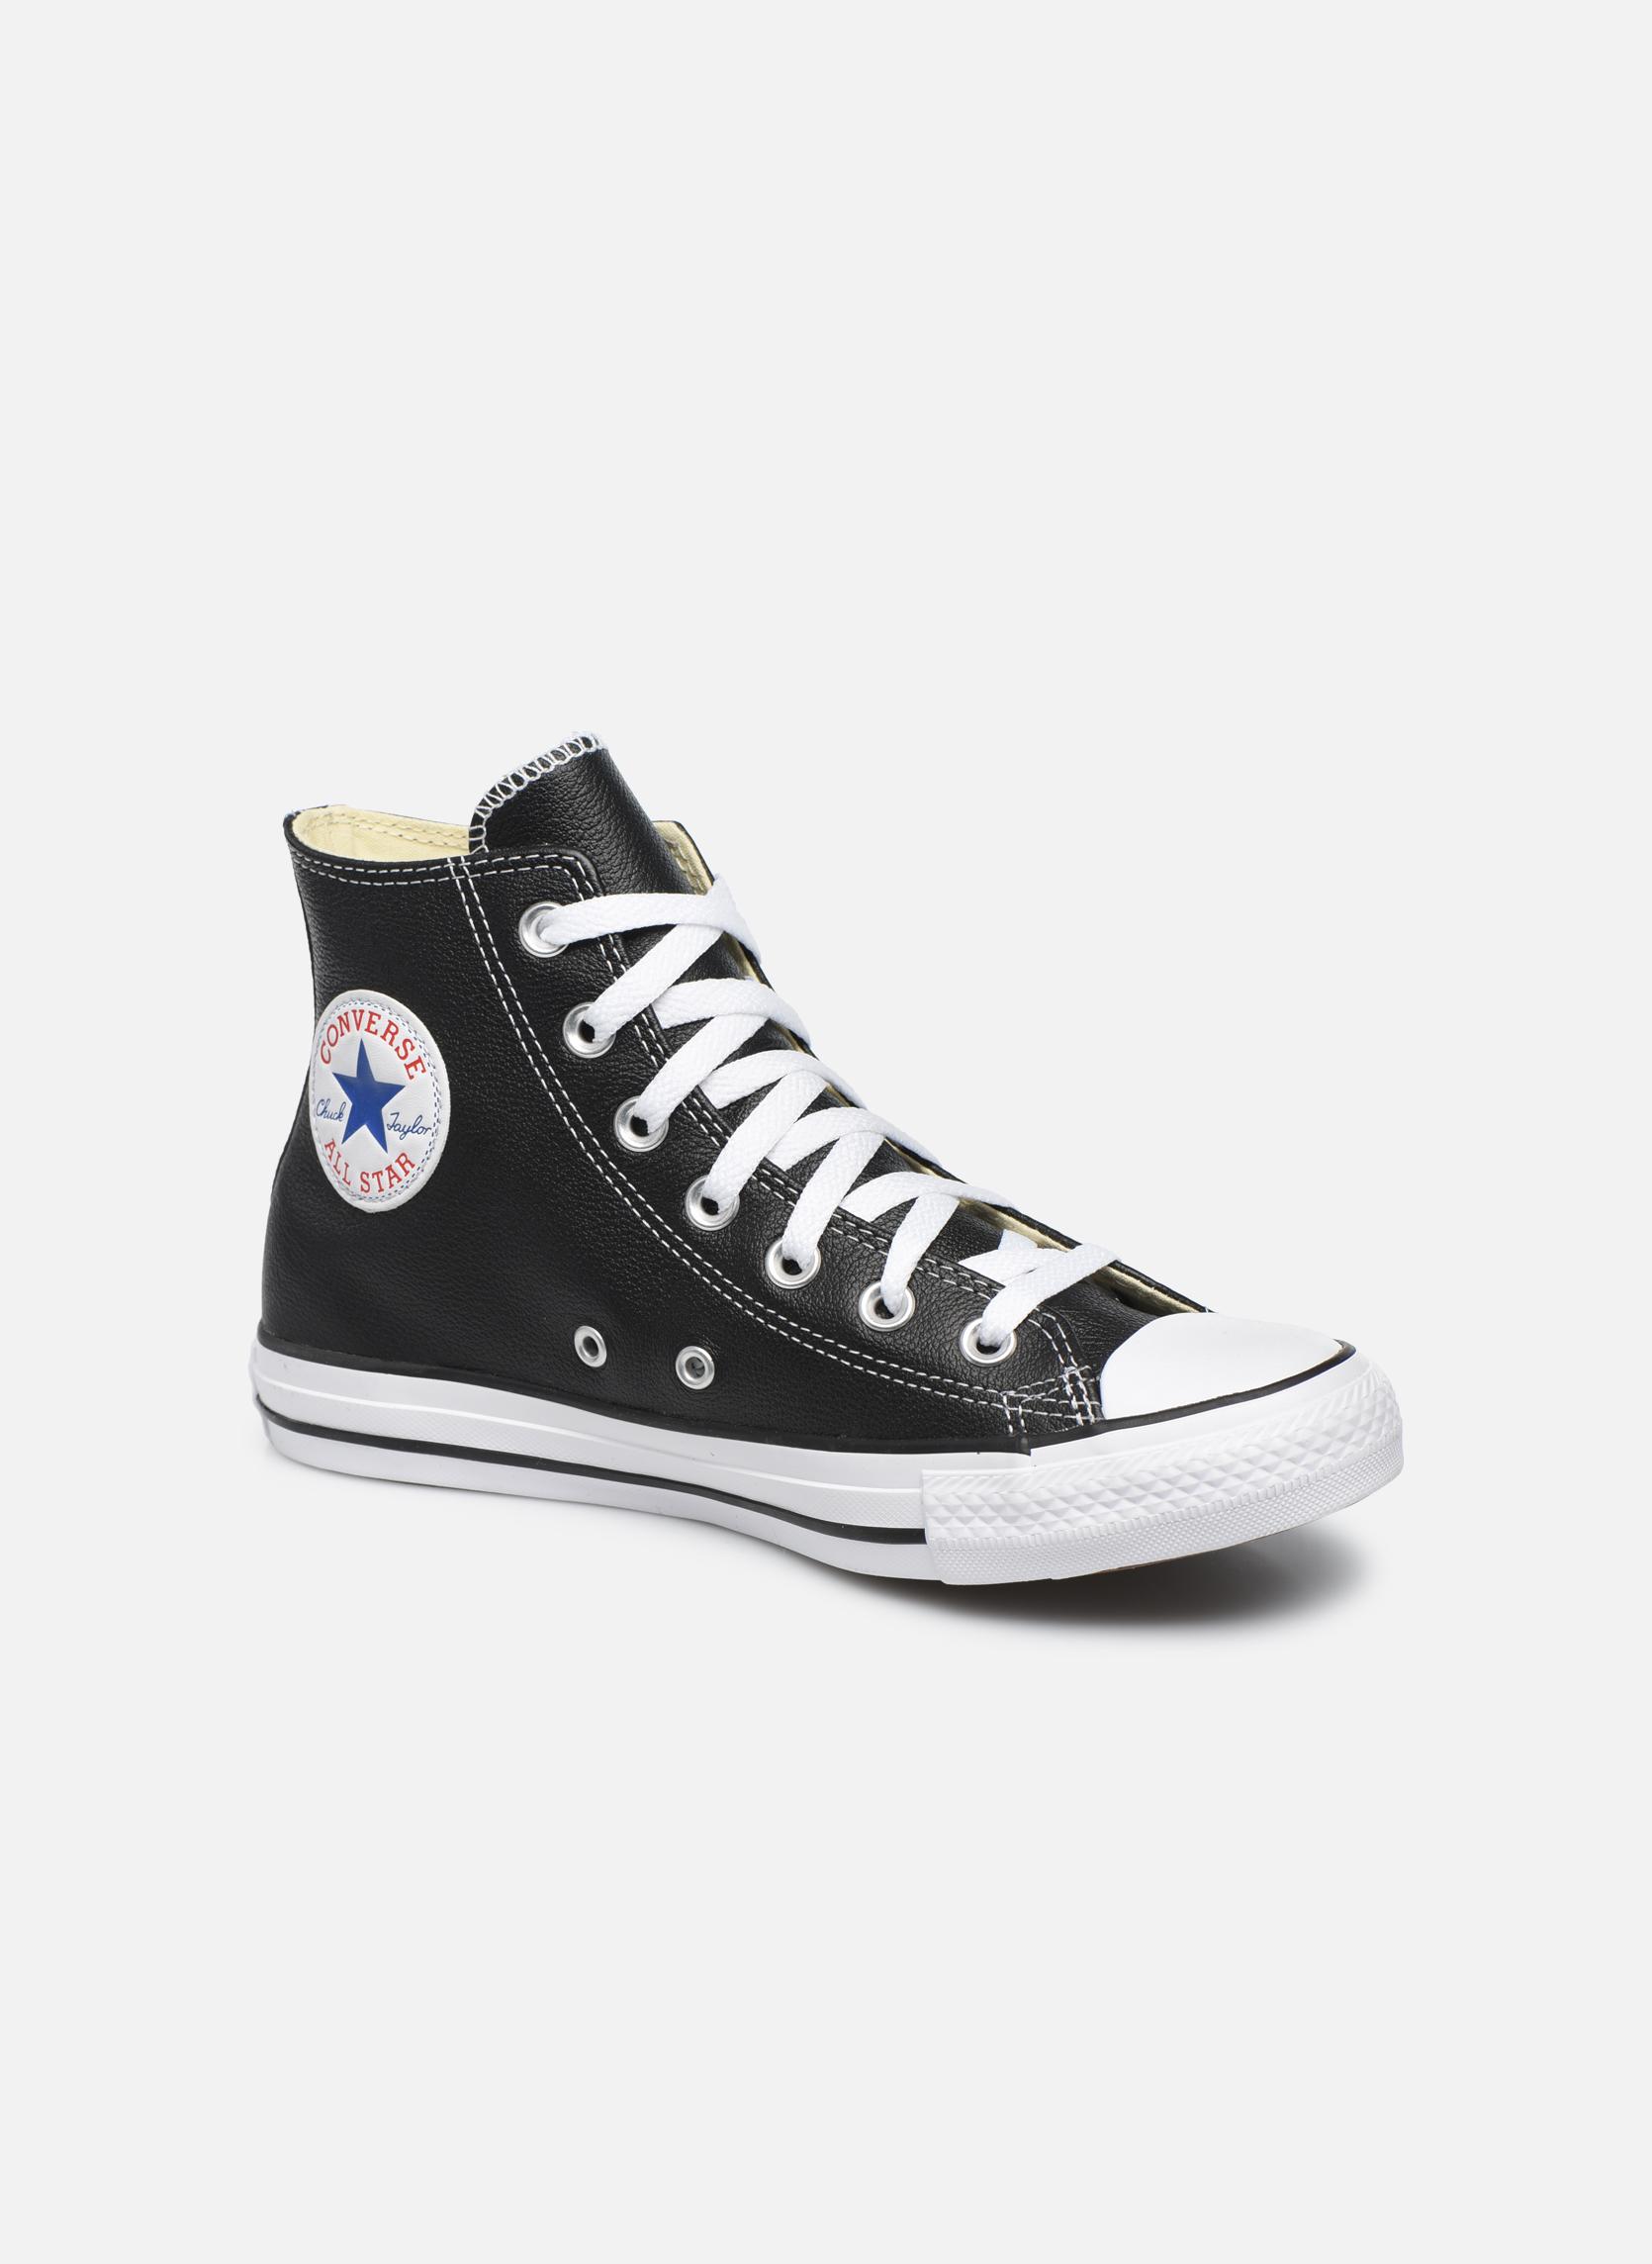 Converse Chuck Taylor All Star Leather Hi W